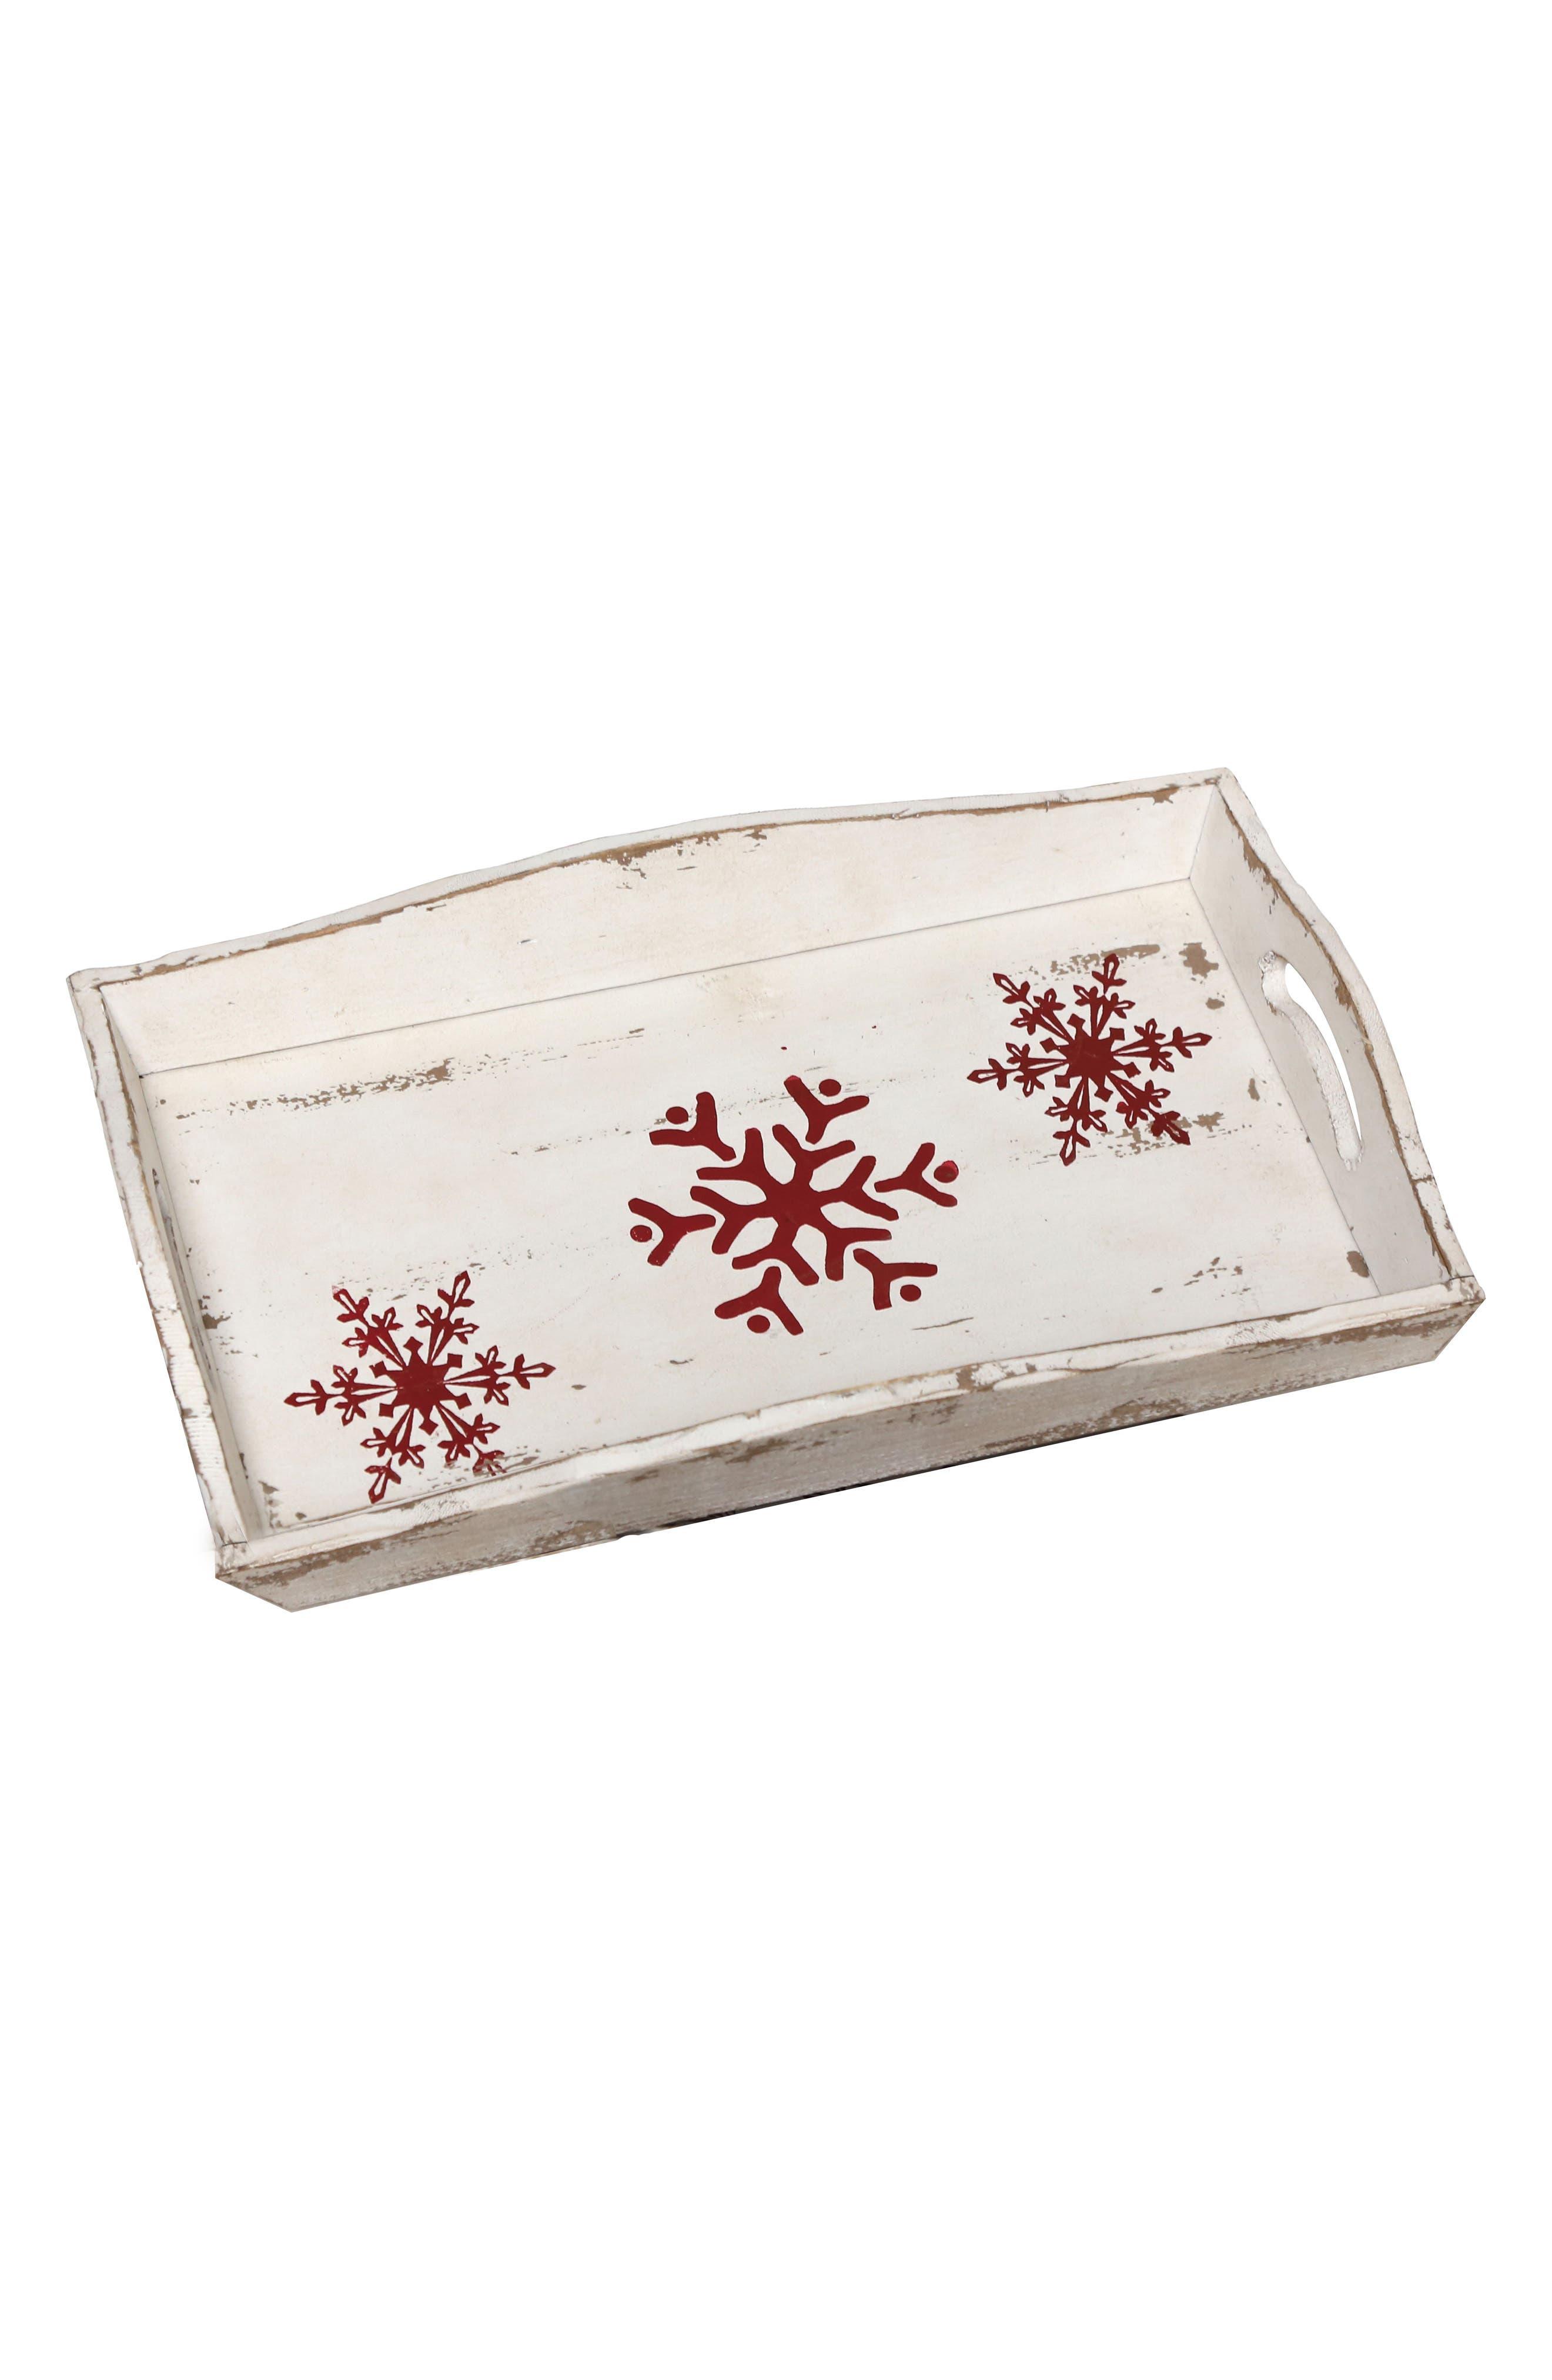 Main Image - Foreside Snowflake Wood Tray